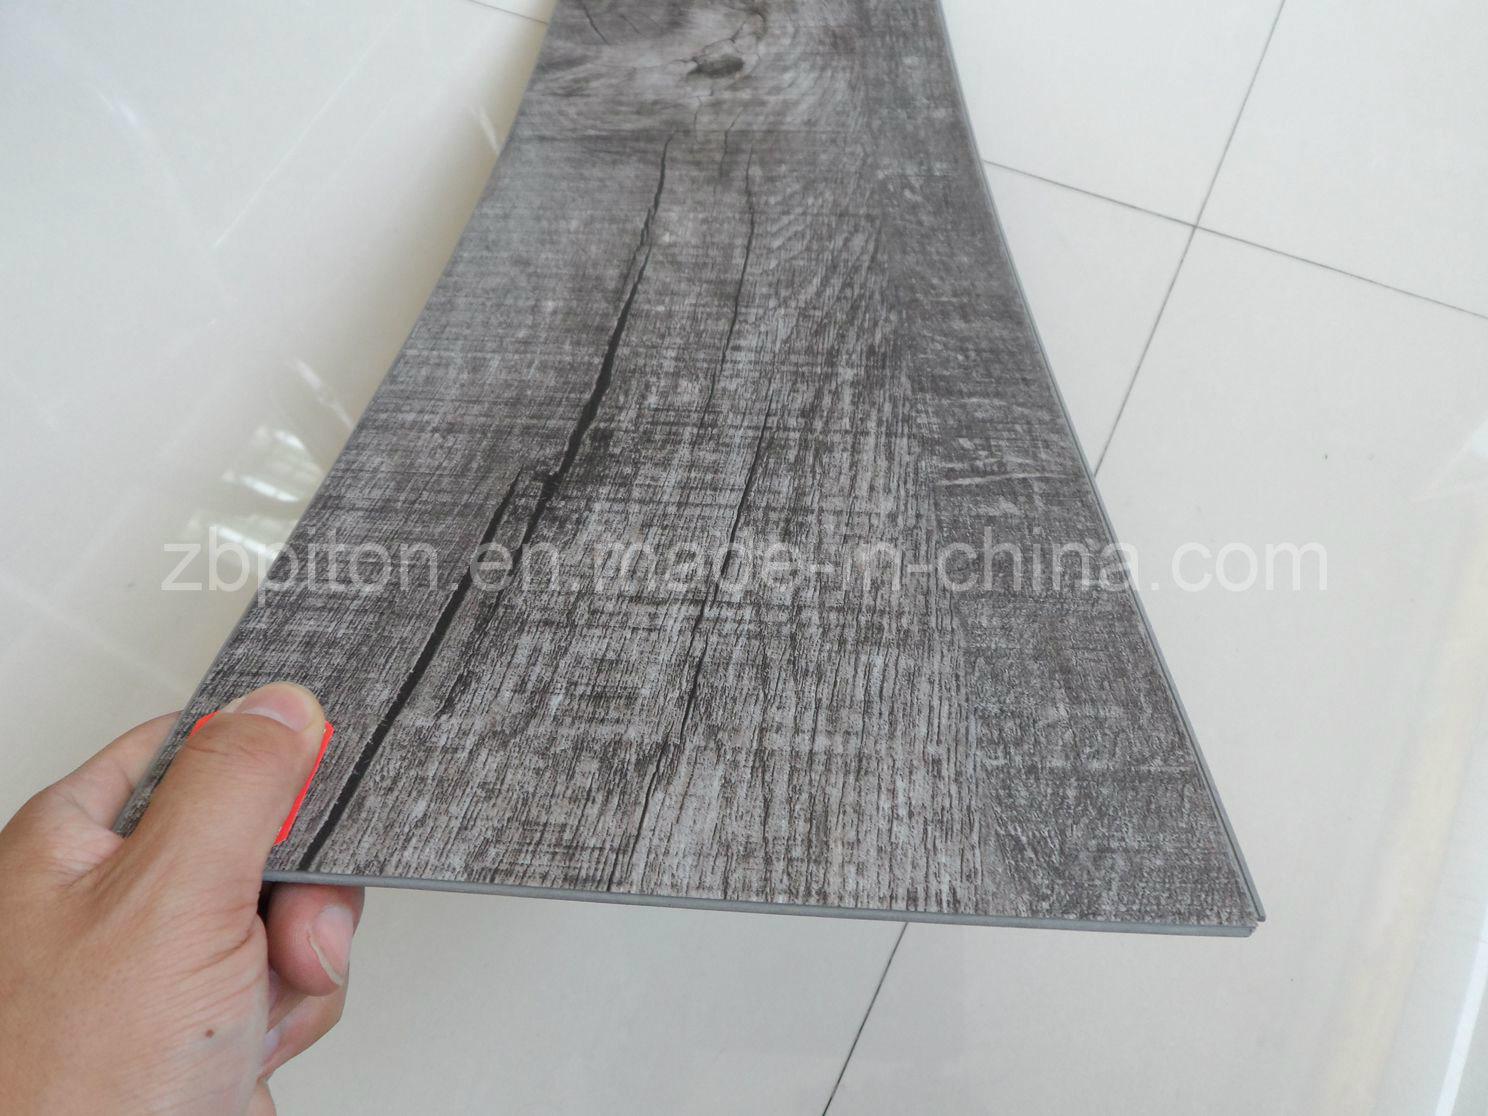 vinyl locking flooring. Black Bedroom Furniture Sets. Home Design Ideas